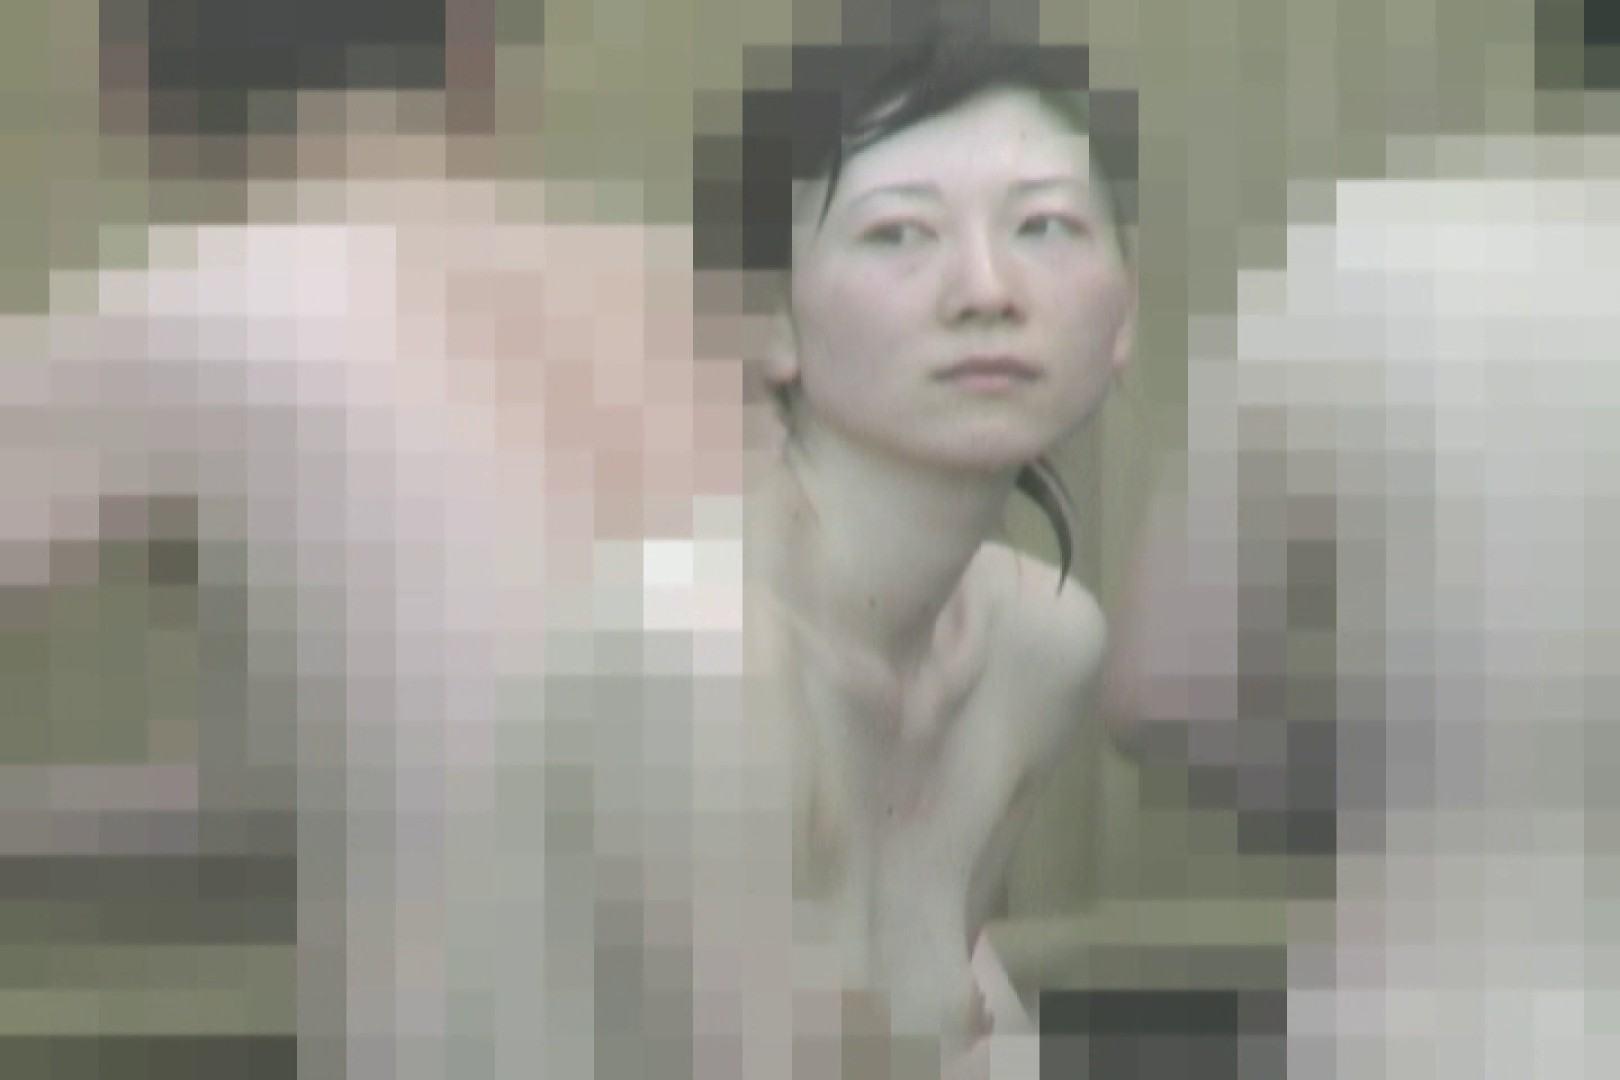 Aquaな露天風呂Vol.835 盗撮 | HなOL  73pic 65